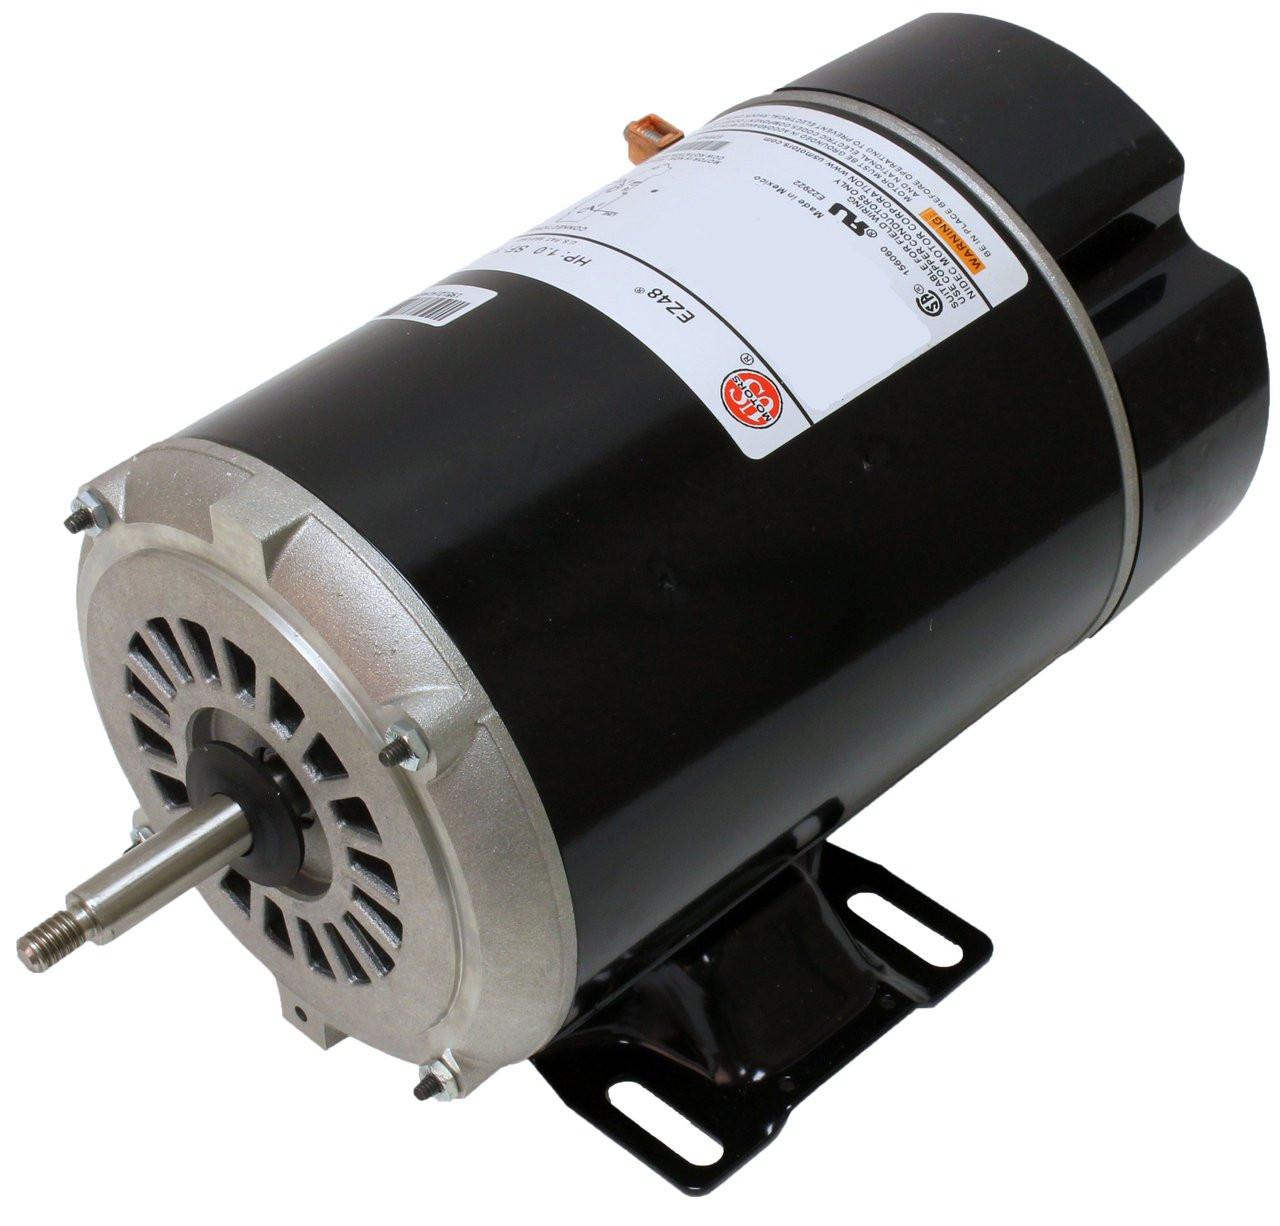 EZBN25__39141.1435584884.1280.1280?c\=2 hayward max flo wiring diagram 115v hayward pool motors 1 5 hp Hayward Pro Max at nearapp.co